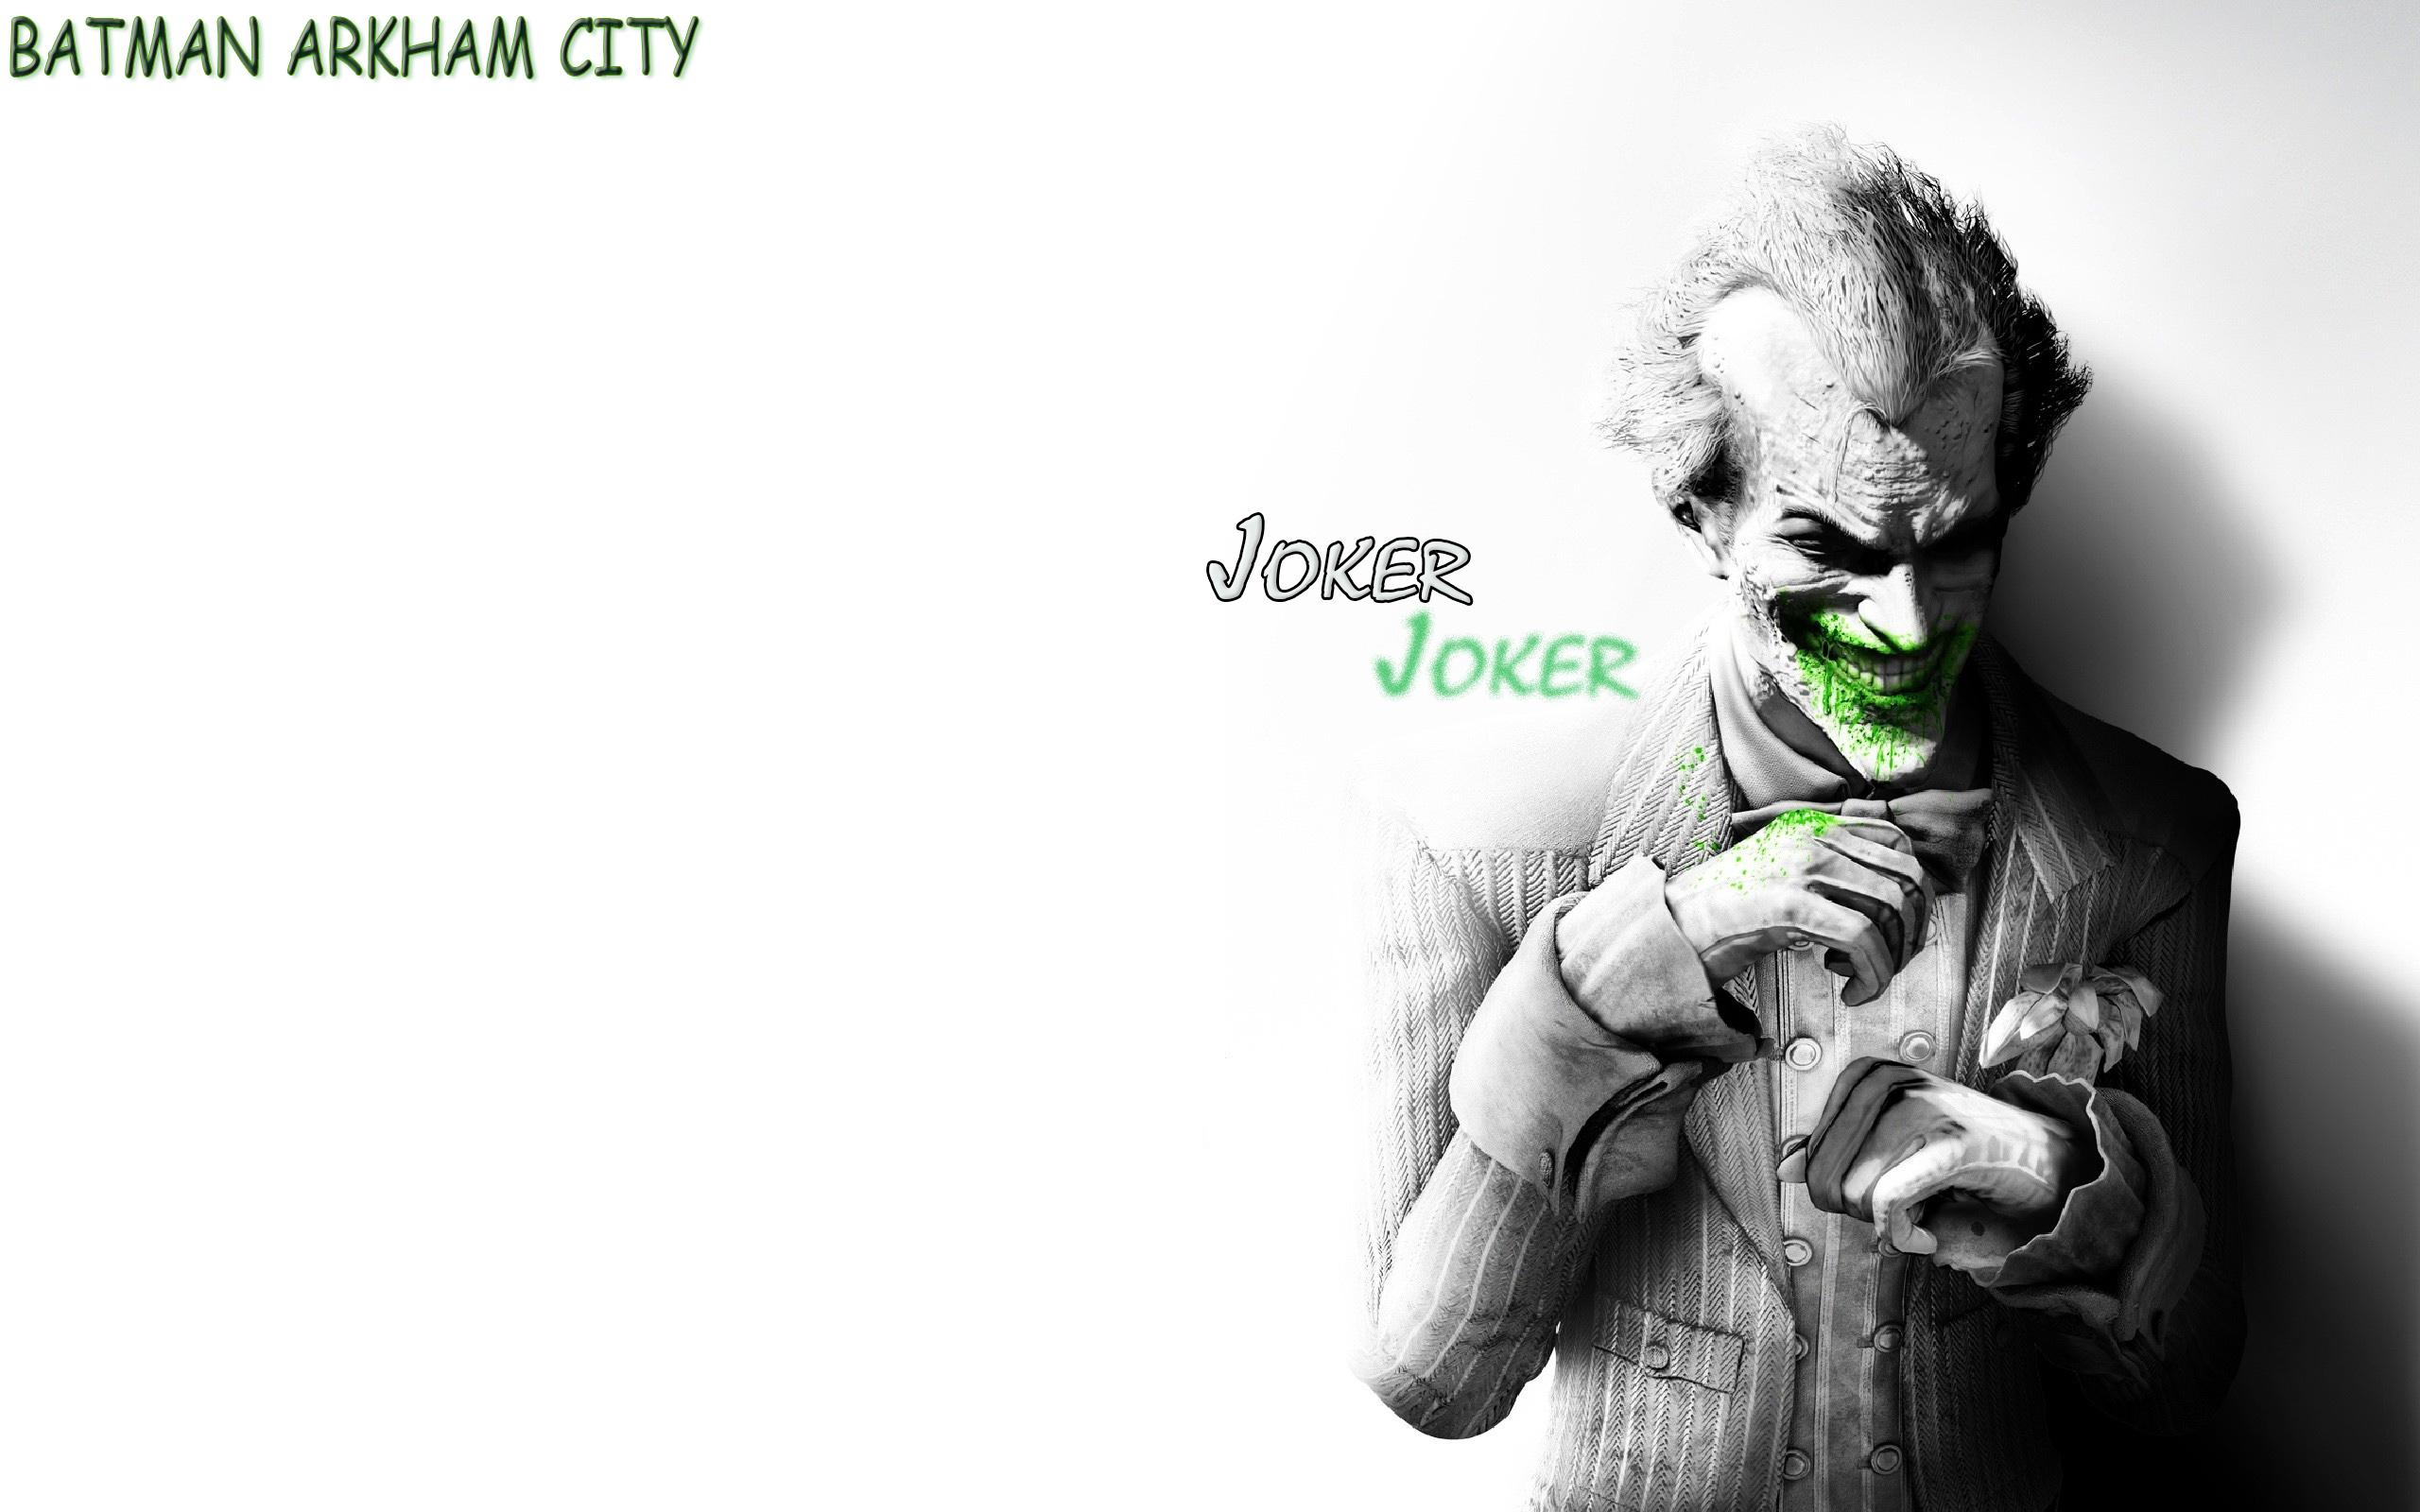 HDoboi.Kiev.ua - Джокер на обои айфон, Joker